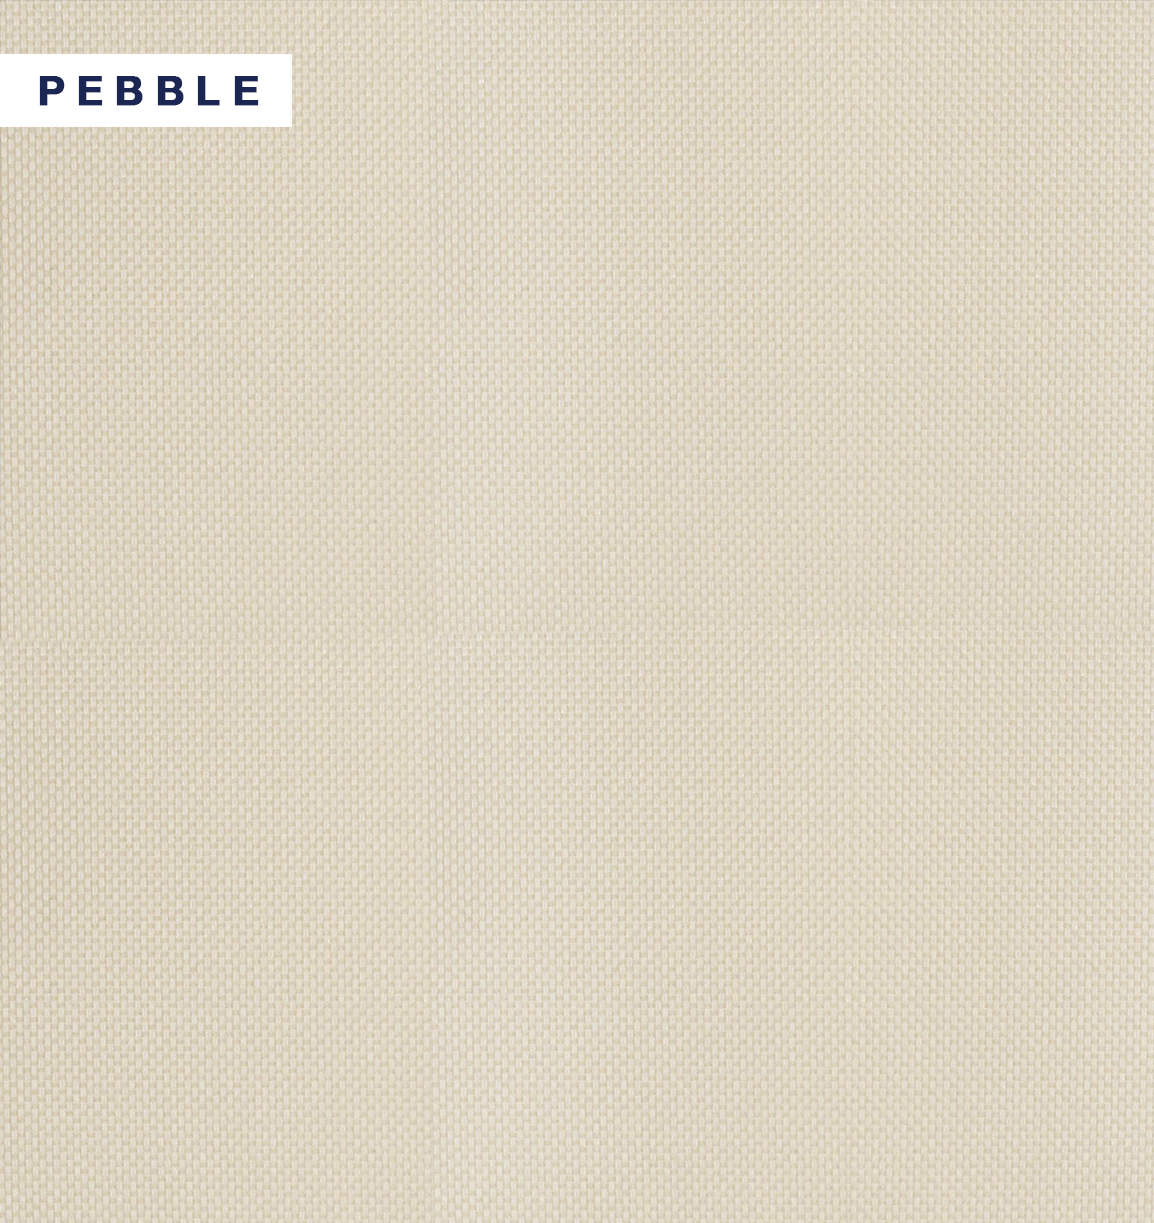 Phoenix - Pebble.jpg